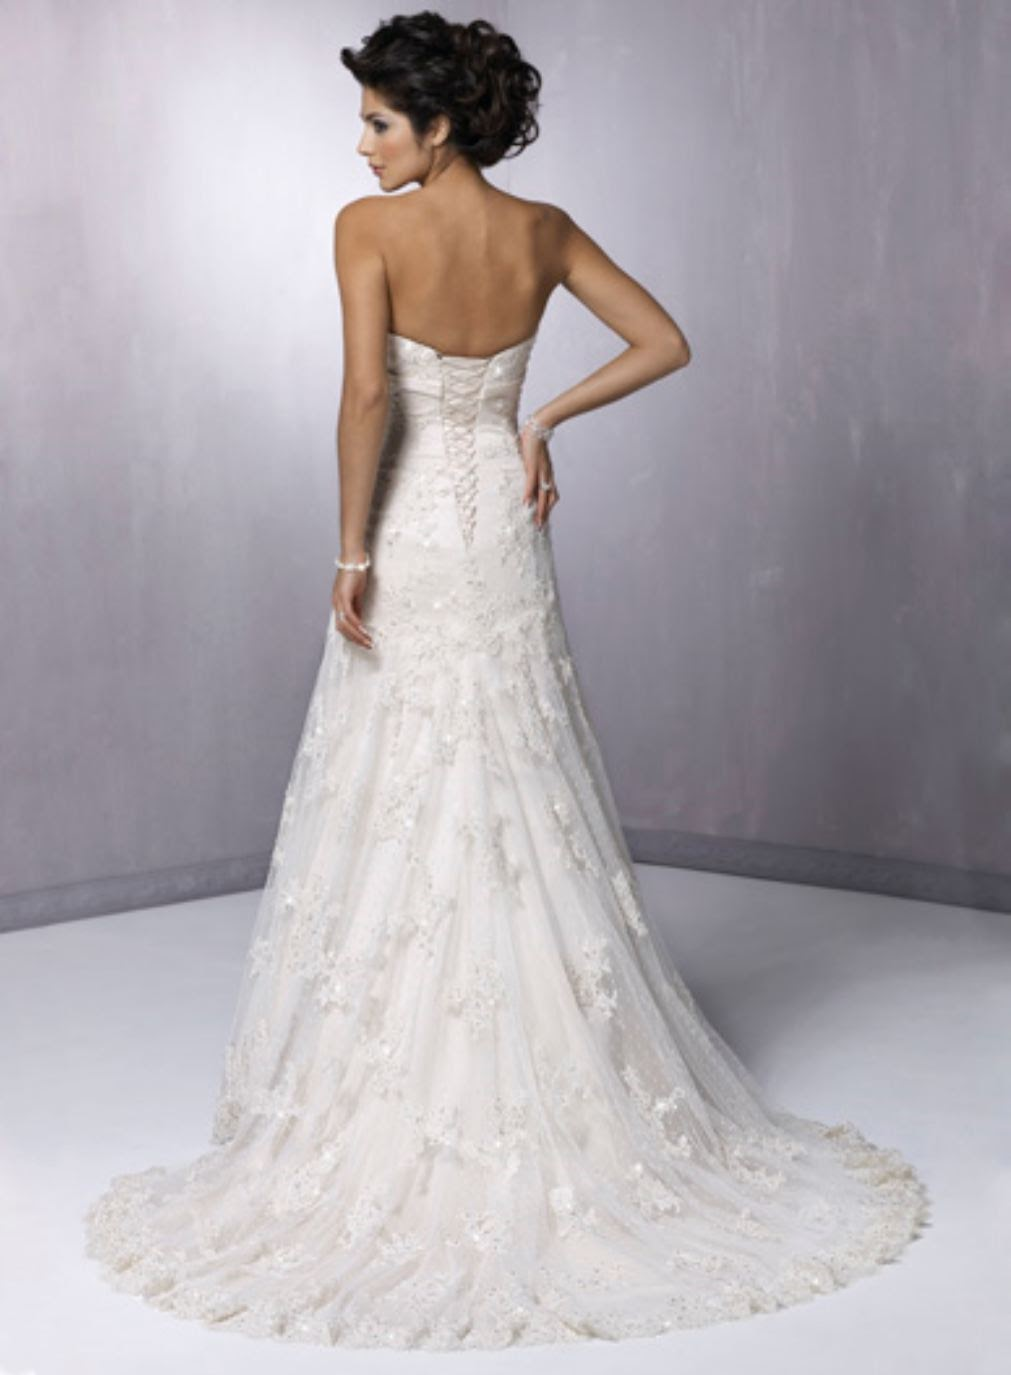 Boutique mix fashion kate moss 39 john galliano wedding for Wedding dresses lace strapless